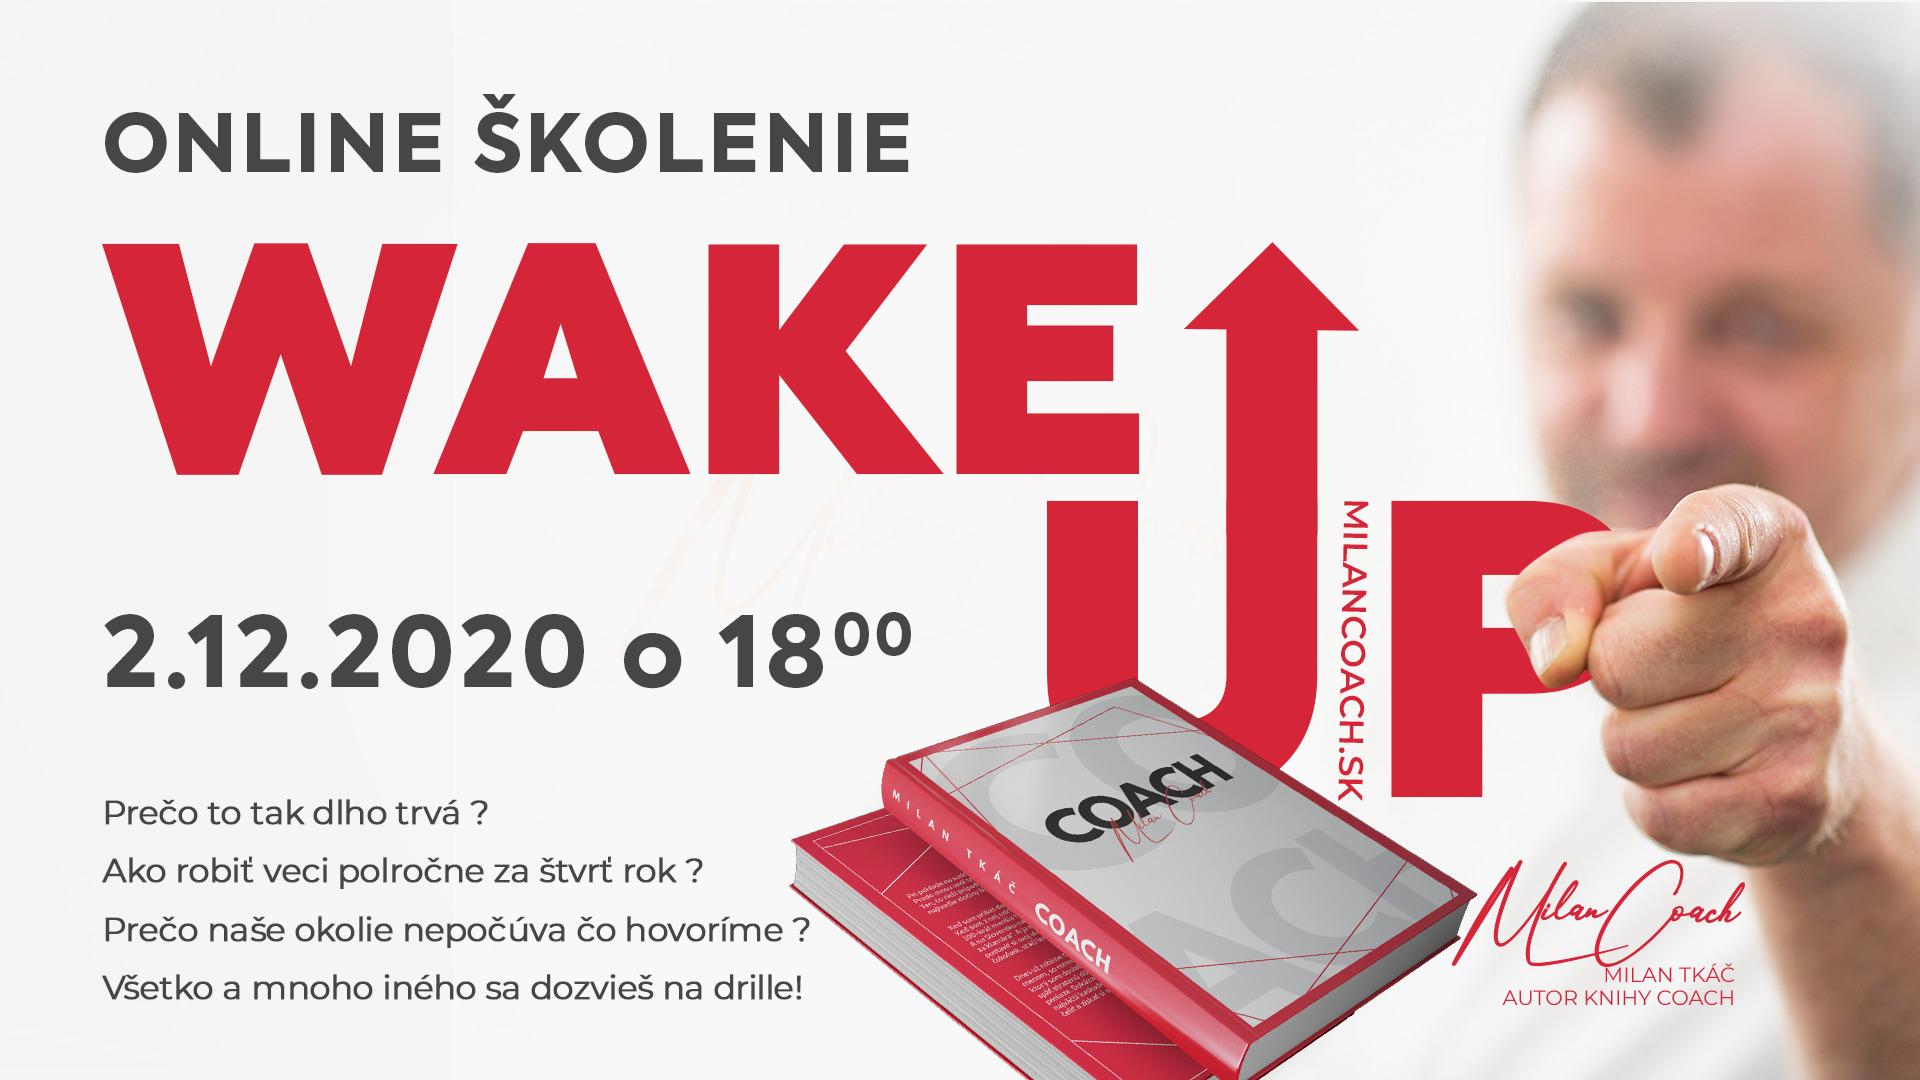 wake up skolenie milan tkac